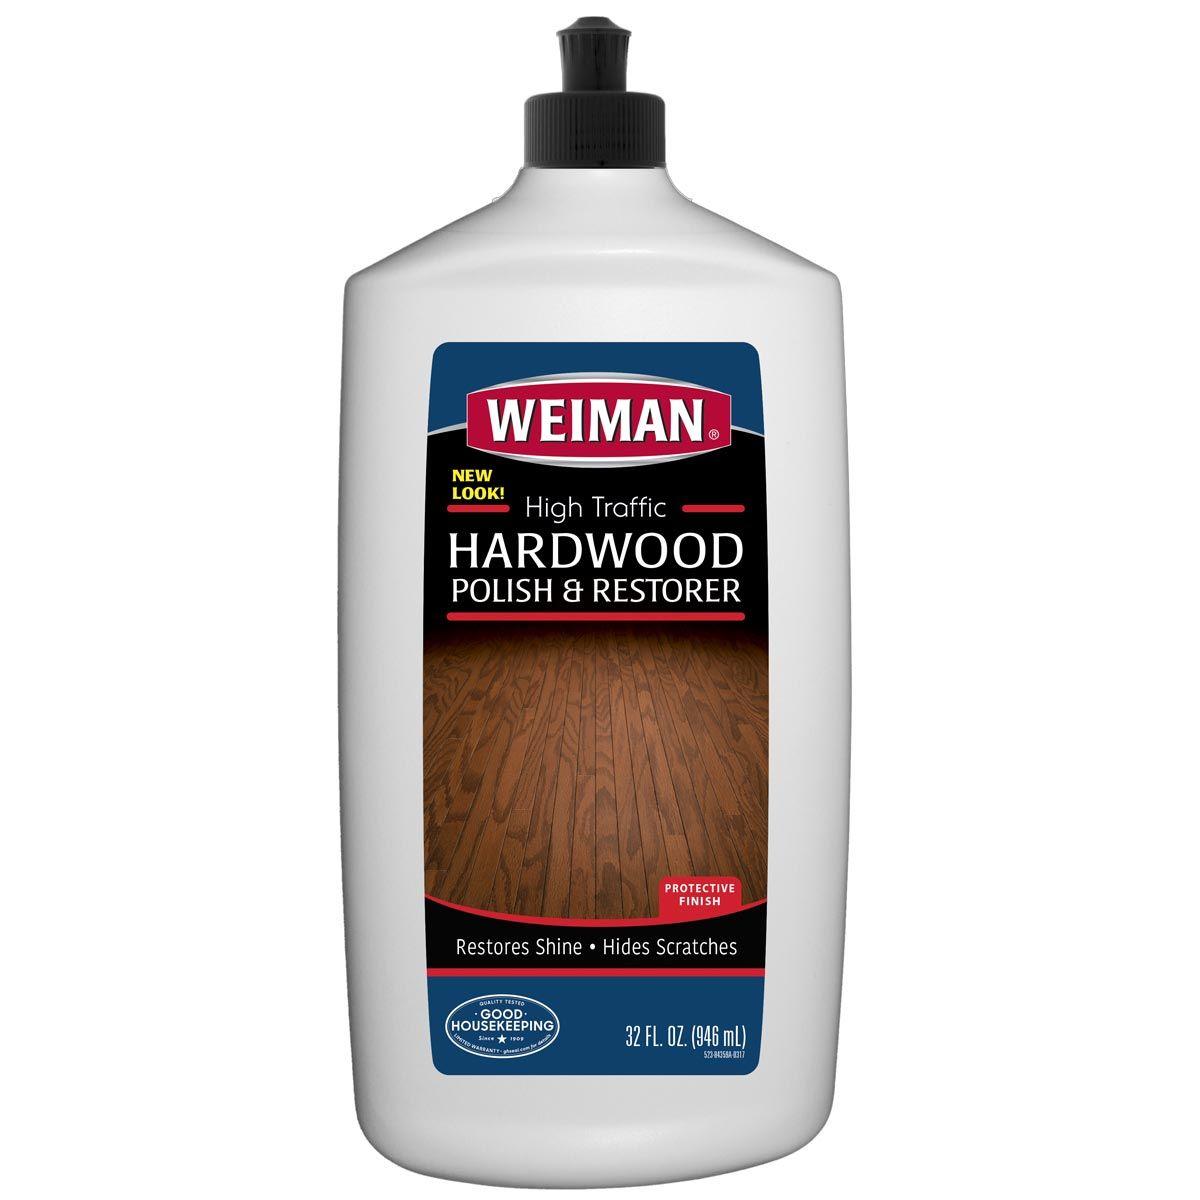 Hardwood Floor High Traffic Polish & Restorer Wood floor